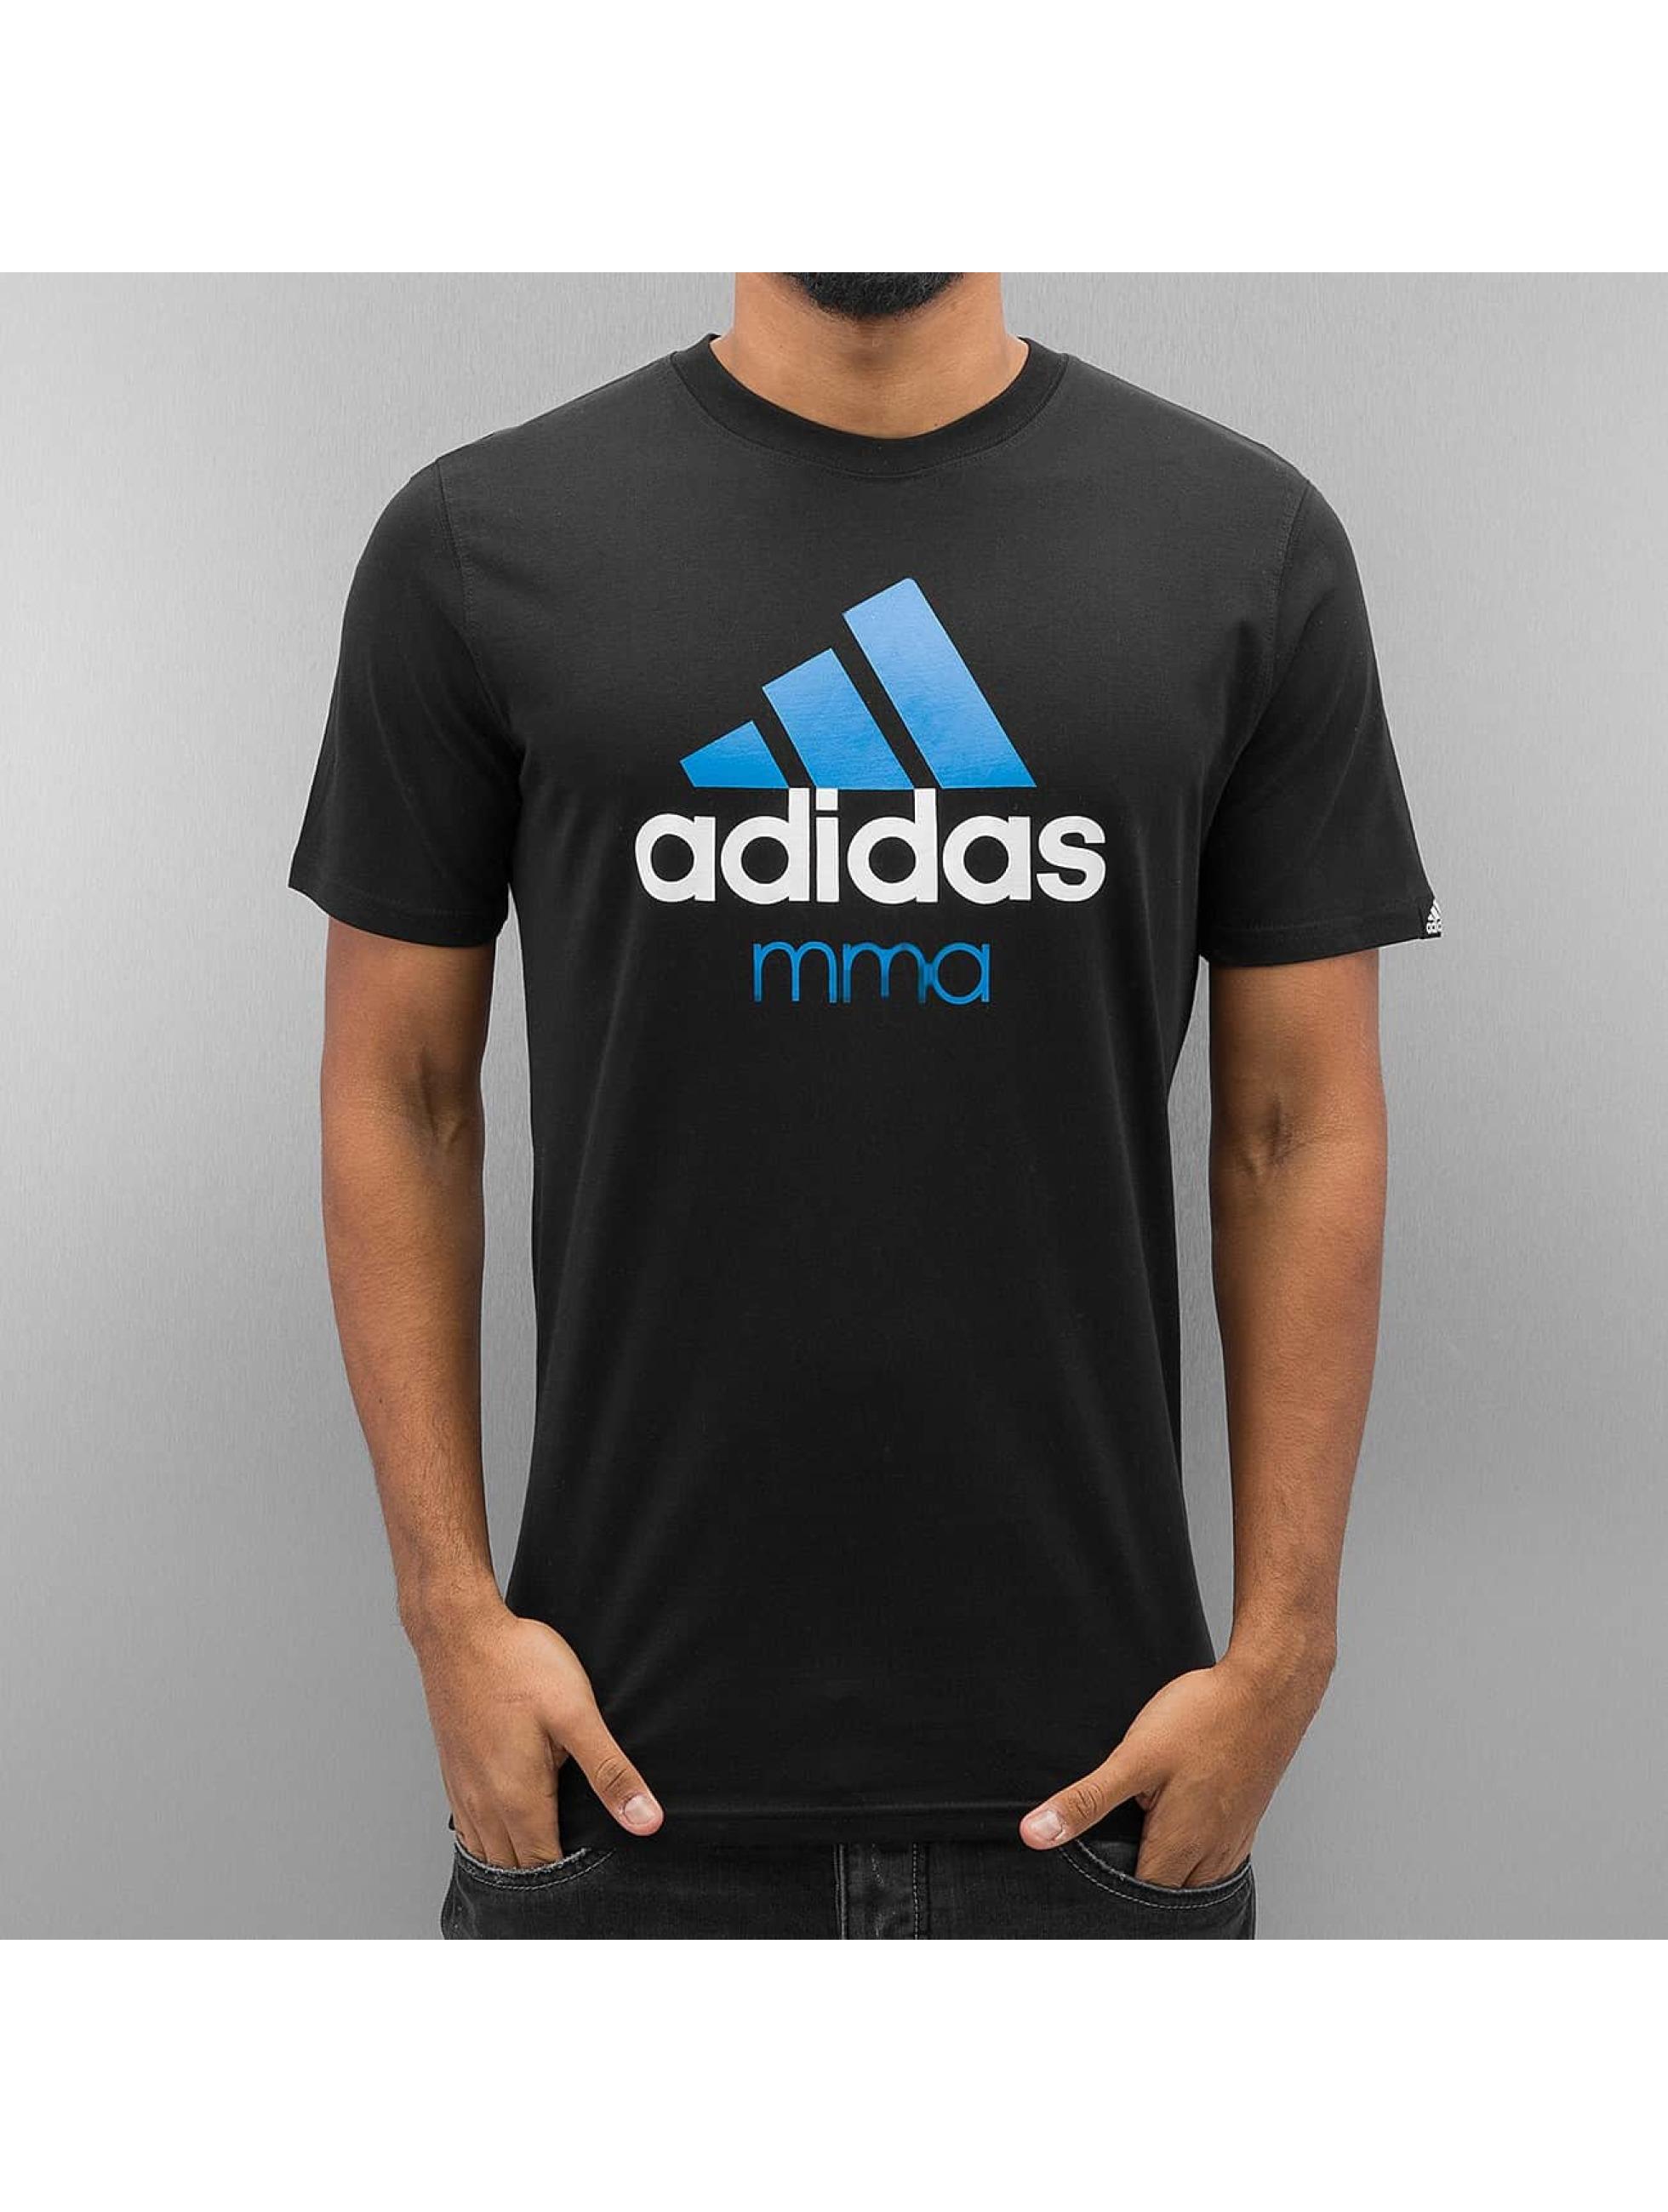 Adidas Boxing MMA Männer T-Shirt Community in s...